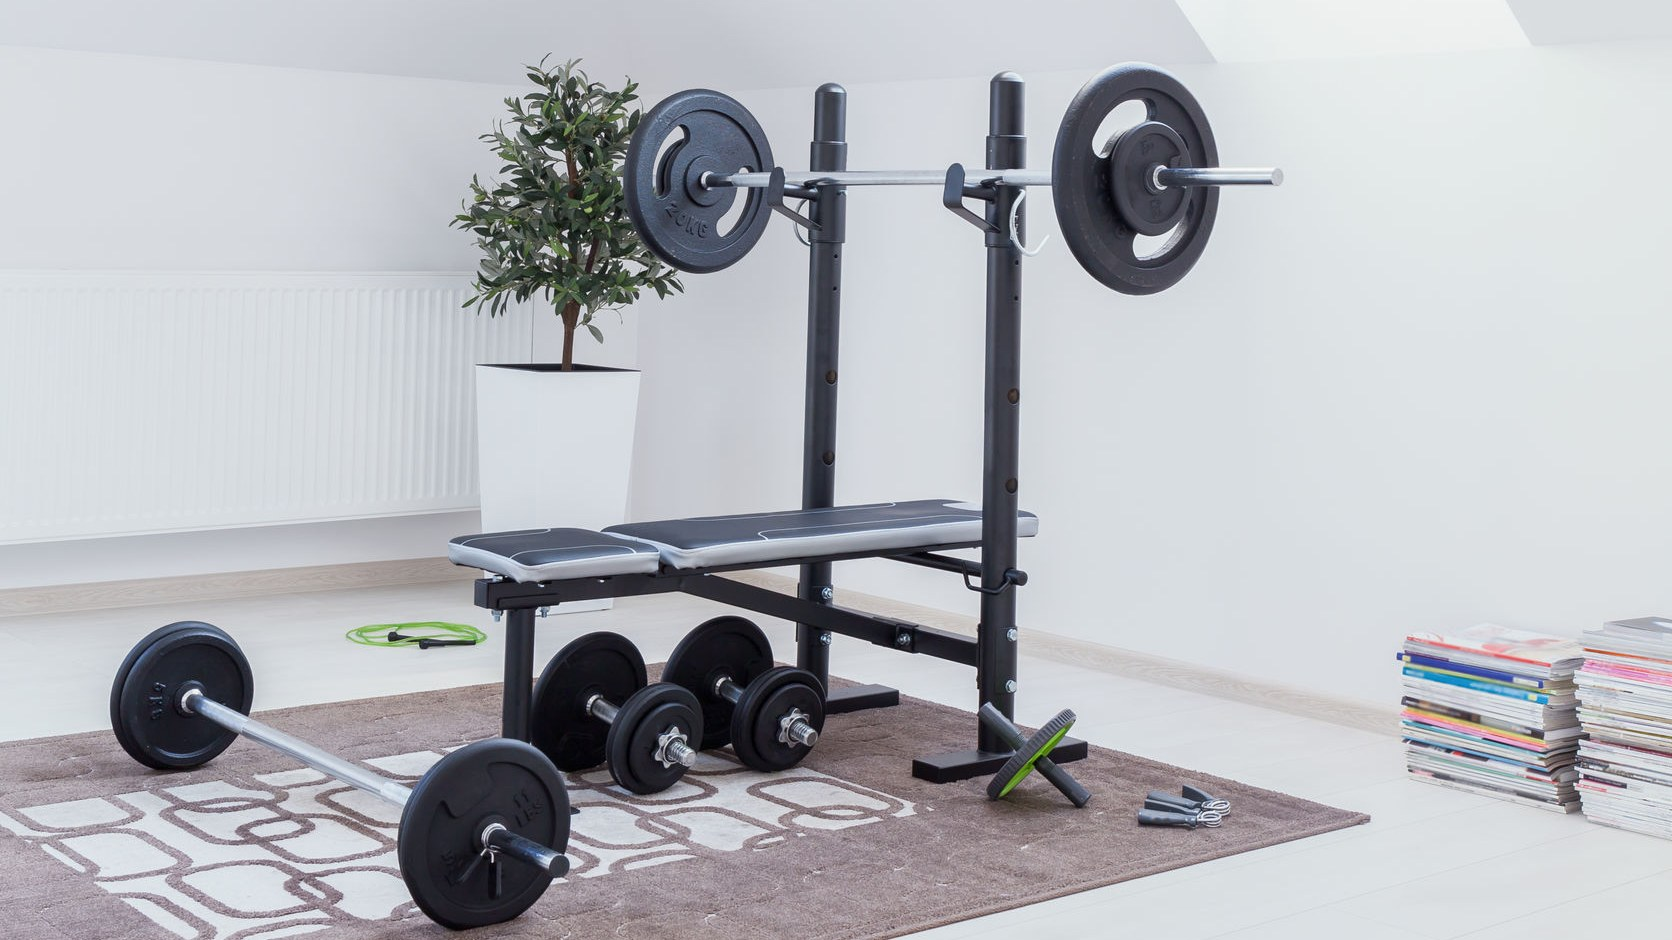 banca de pesas para entrenar en casa